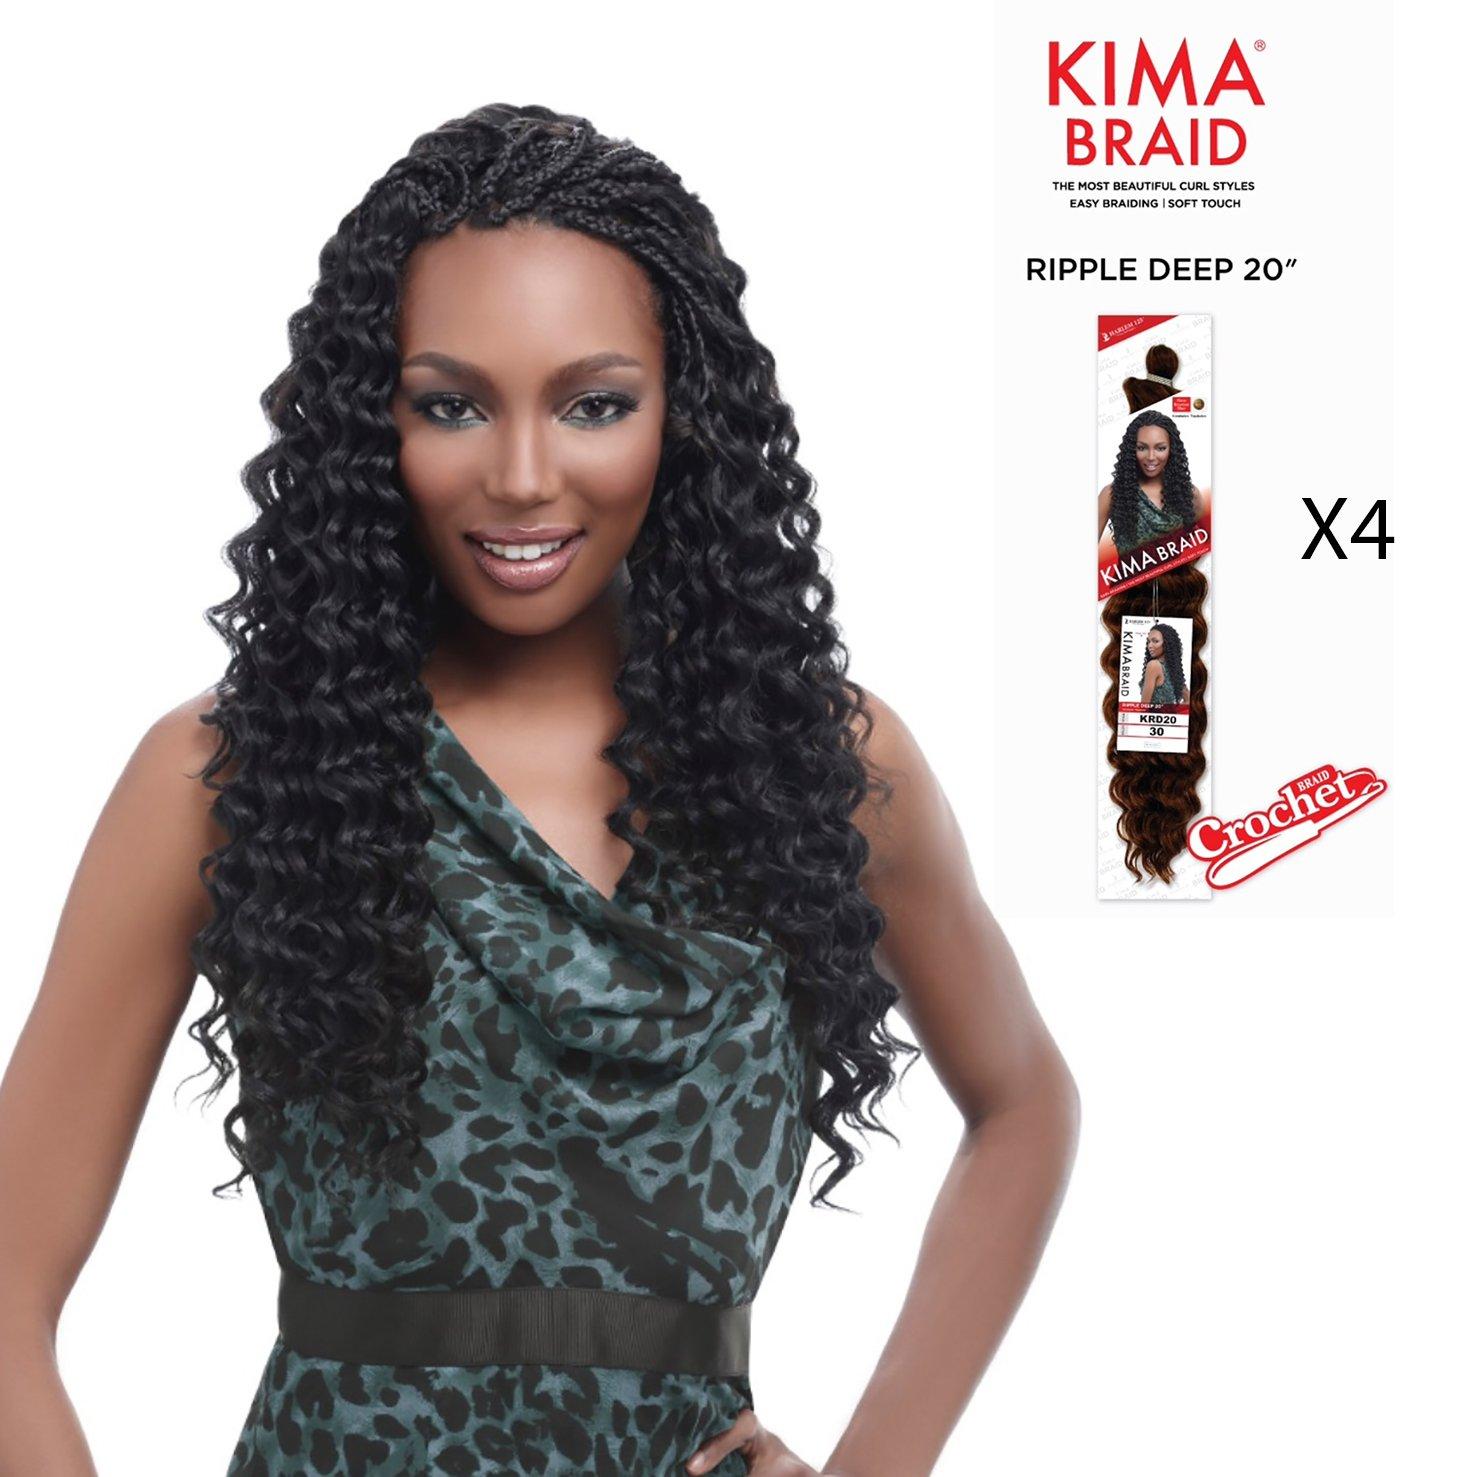 Amazoncom Kima Braid Ripple Deep 20 Crochet Braid 4 Pack